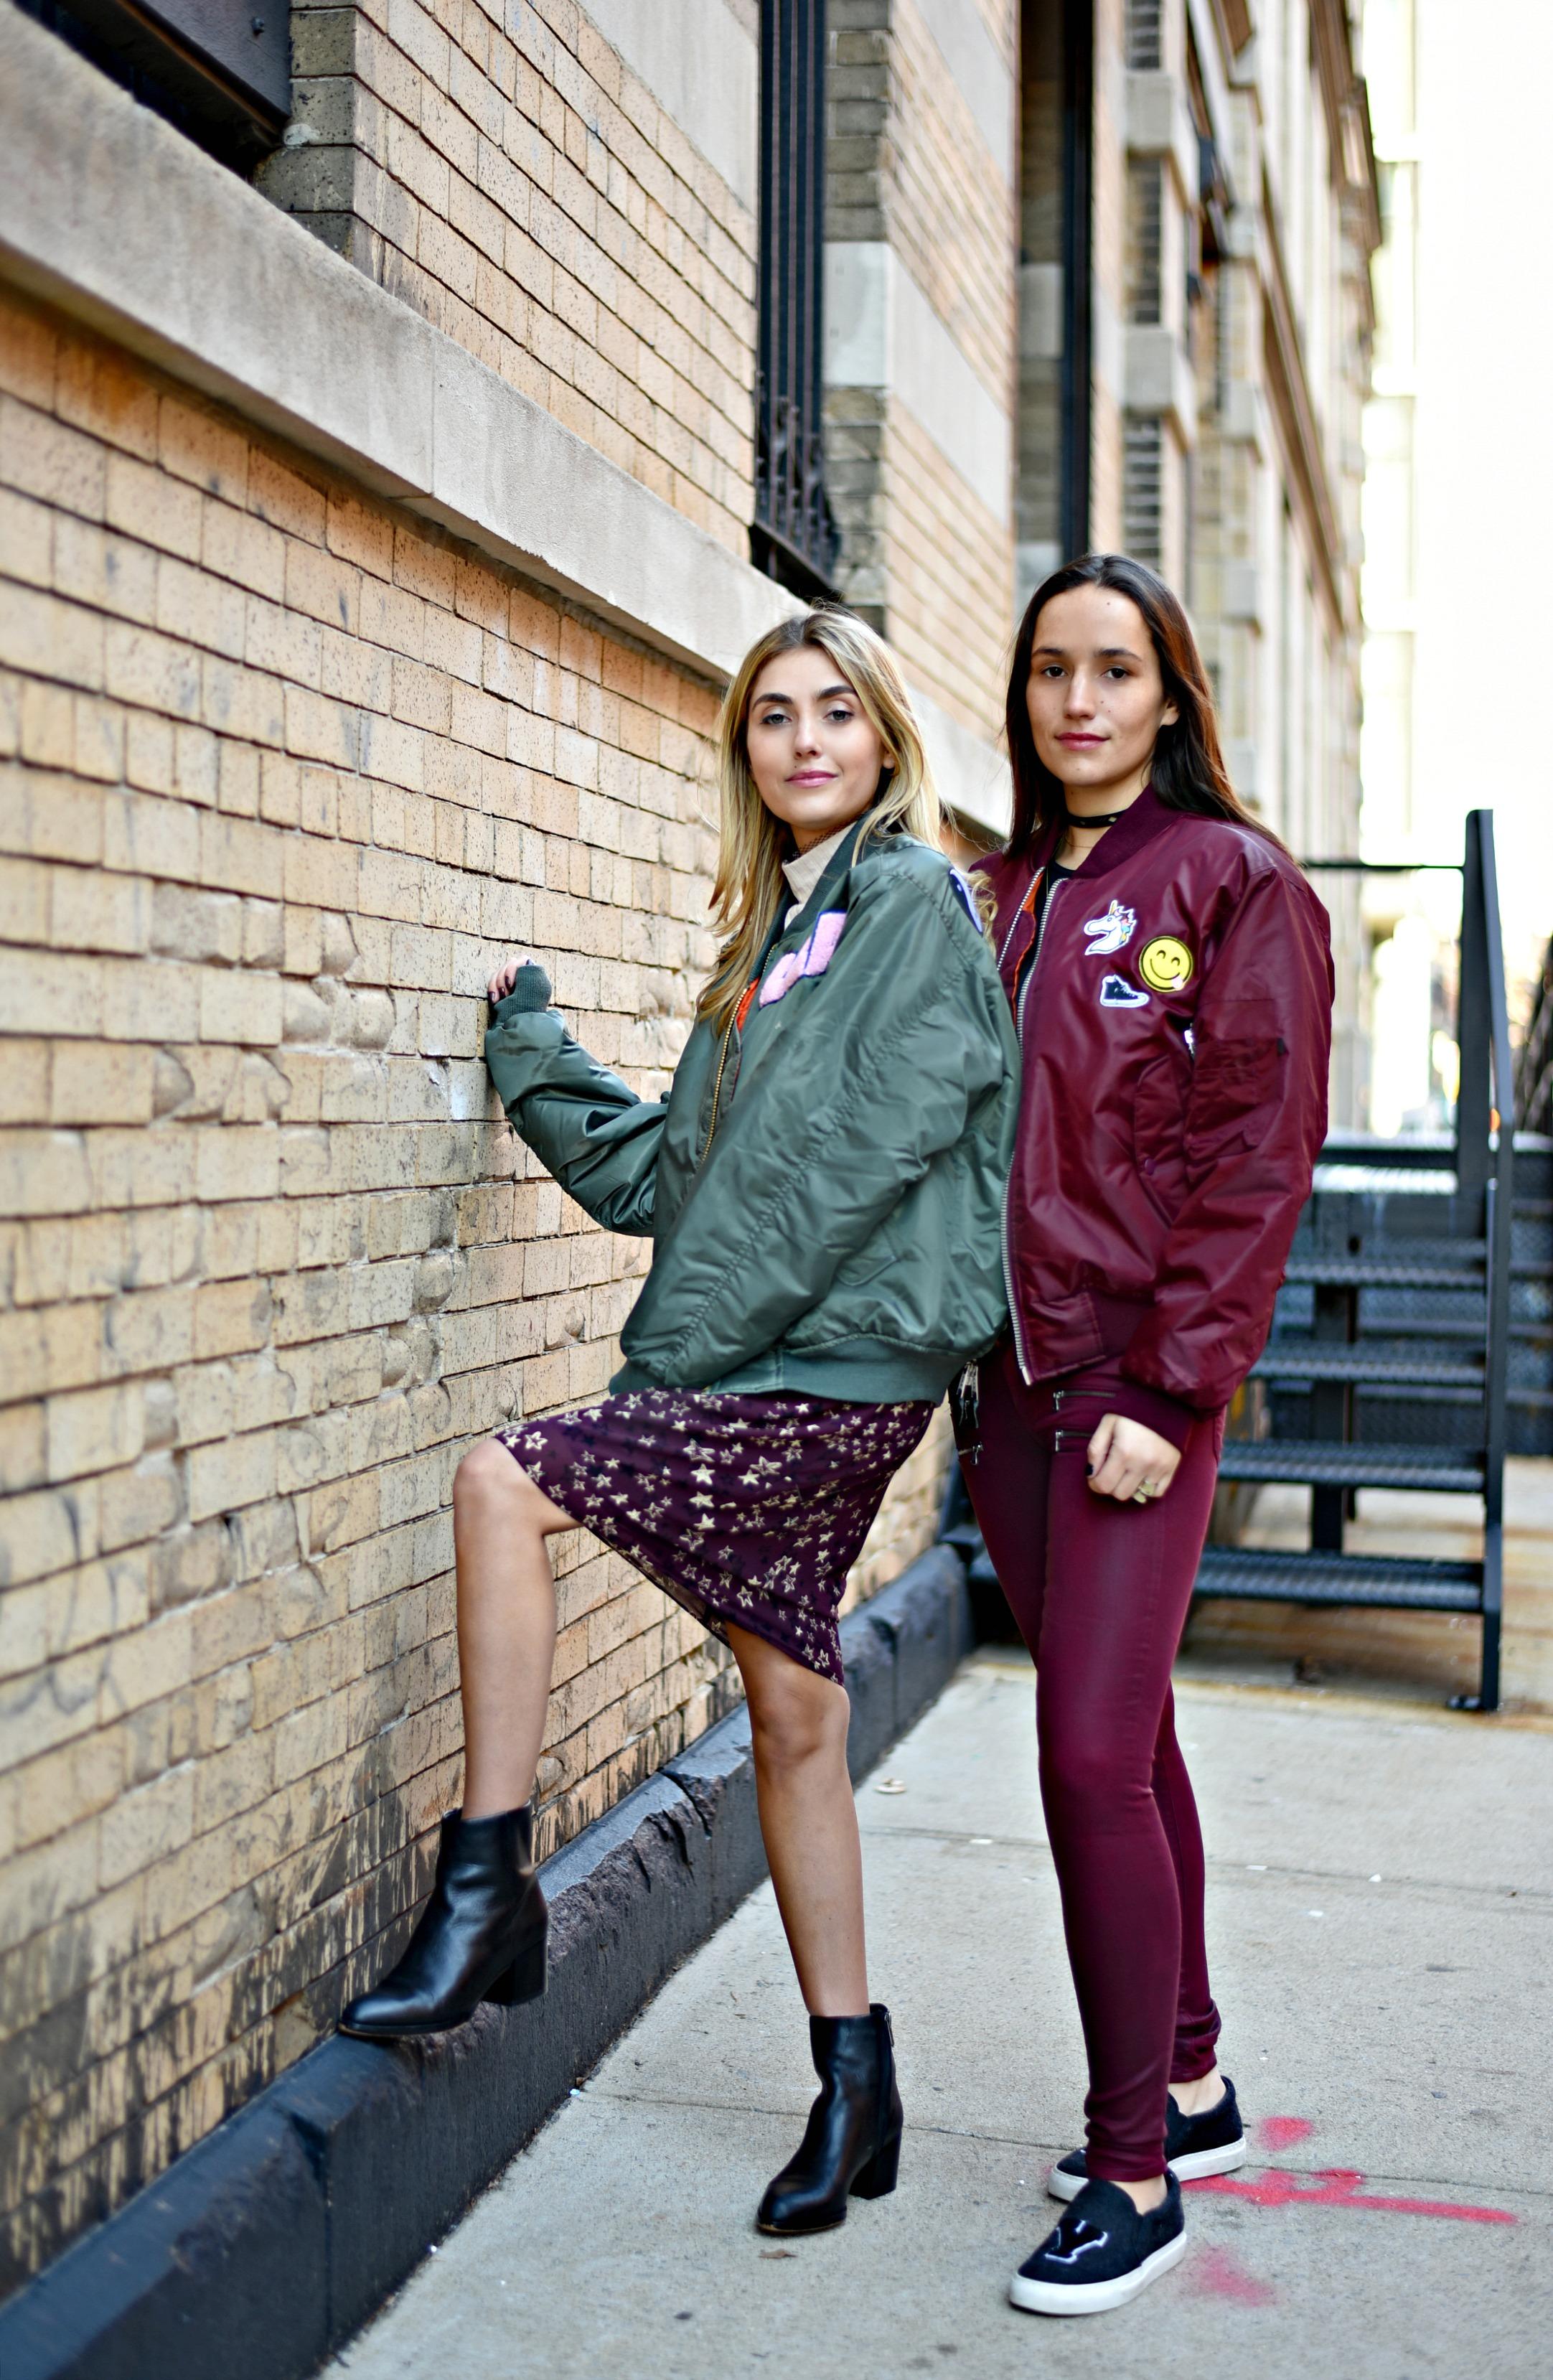 SOPHIE & CHARLOTTE BICKLEY YIN 2MY YANG SISTER FASHION BLOGGERS NYC UNEMPLOYED DENIM POST 1g.jpg